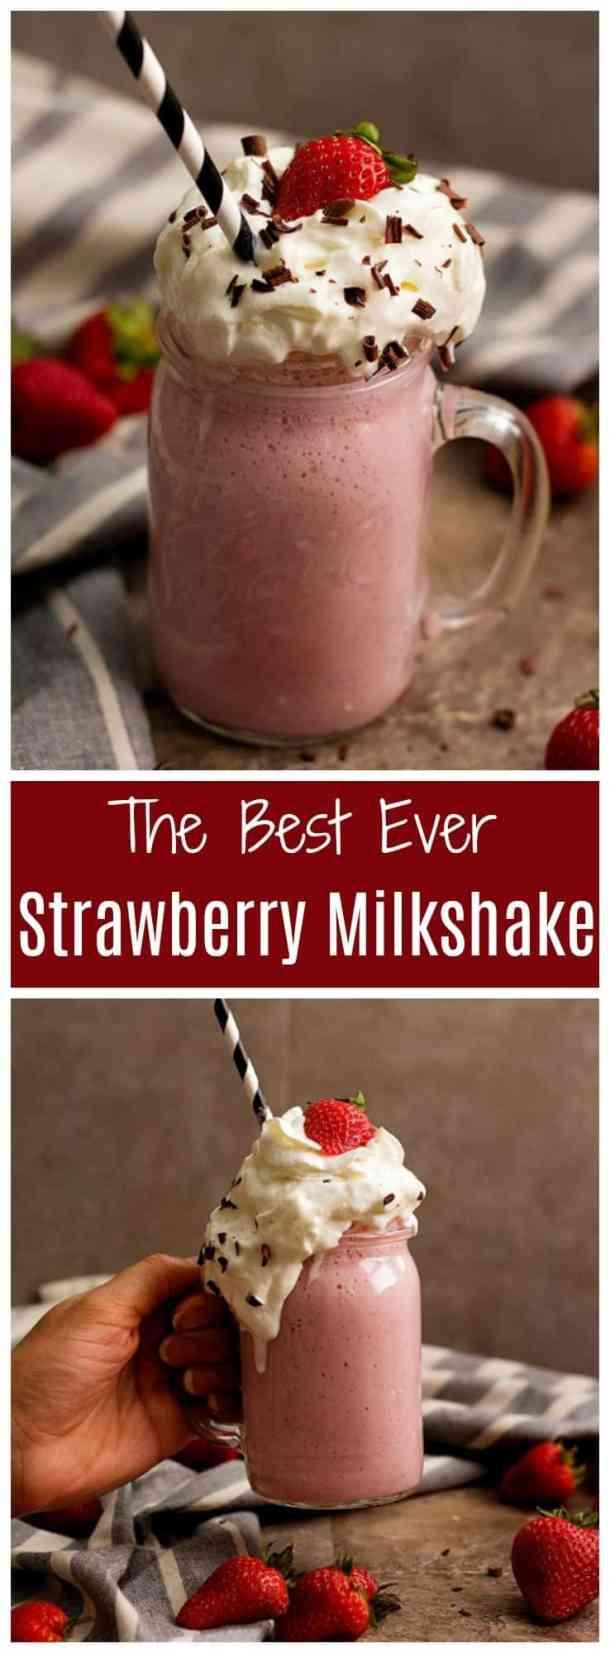 strawberry milkshake | milkshake recipe | summer drink recipes | milkshake | strawberry recipes | summer recipes | fresh strawberries | #milkshake #recipes